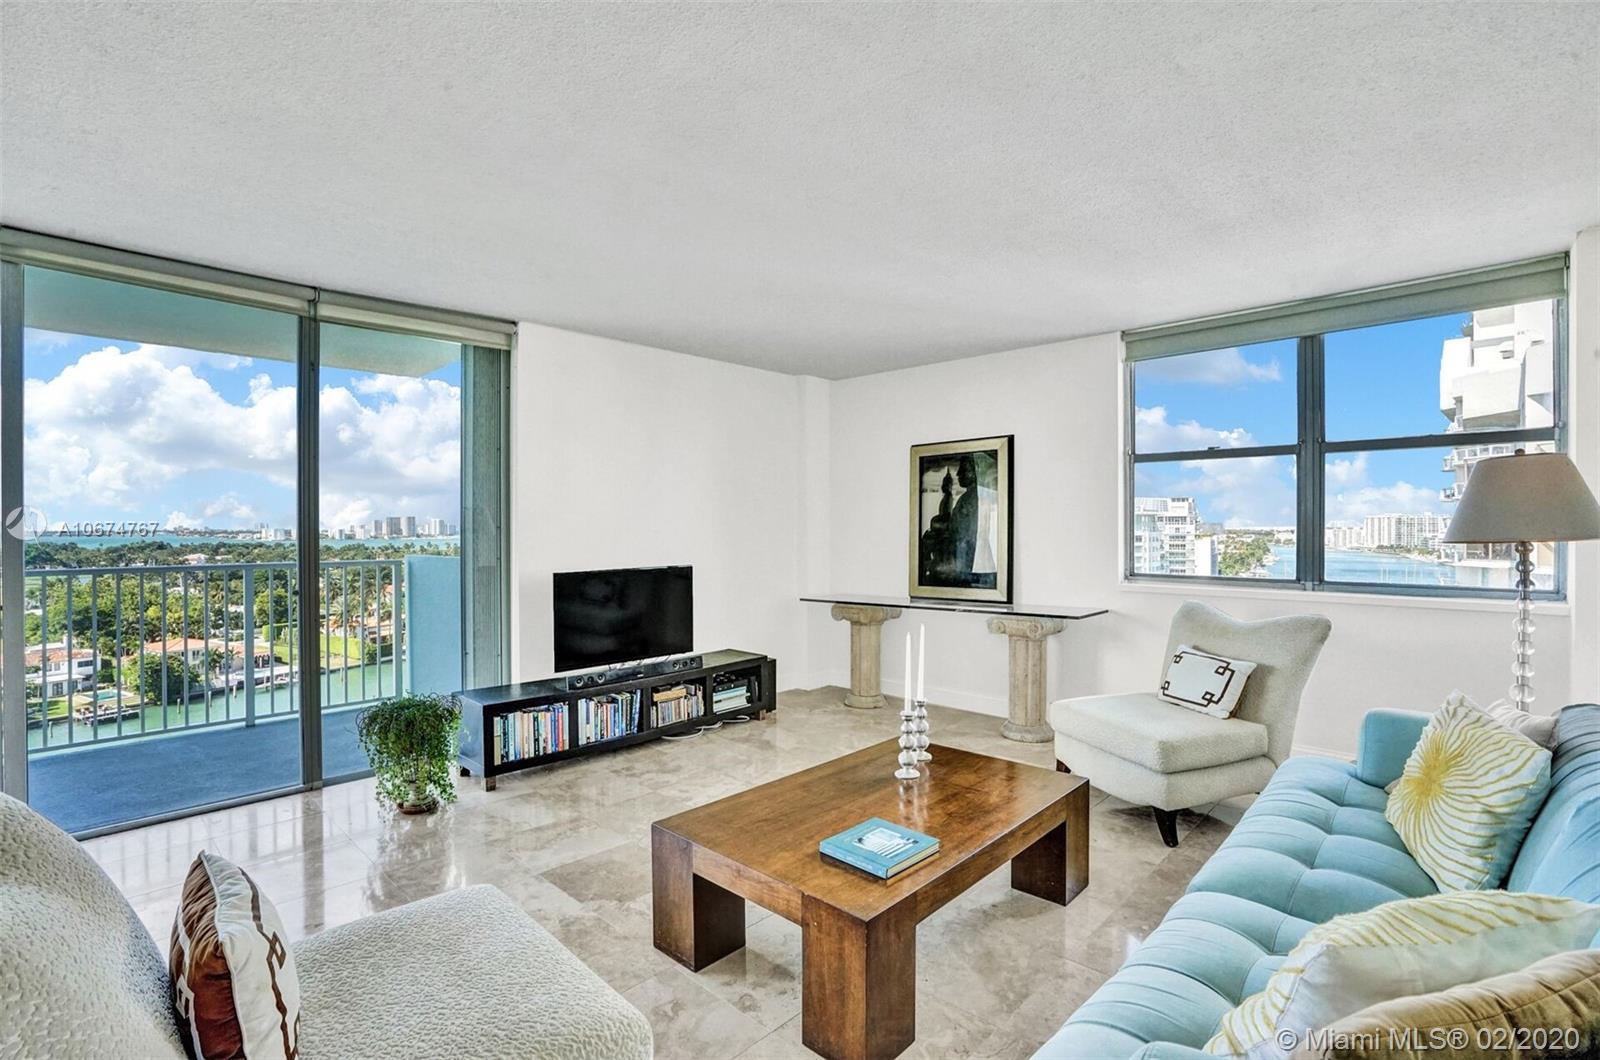 5838 COLLINS AV # 11A, Miami Beach, Florida 33140, 2 Bedrooms Bedrooms, ,2 BathroomsBathrooms,Residential,For Sale,5838 COLLINS AV # 11A,A10674767